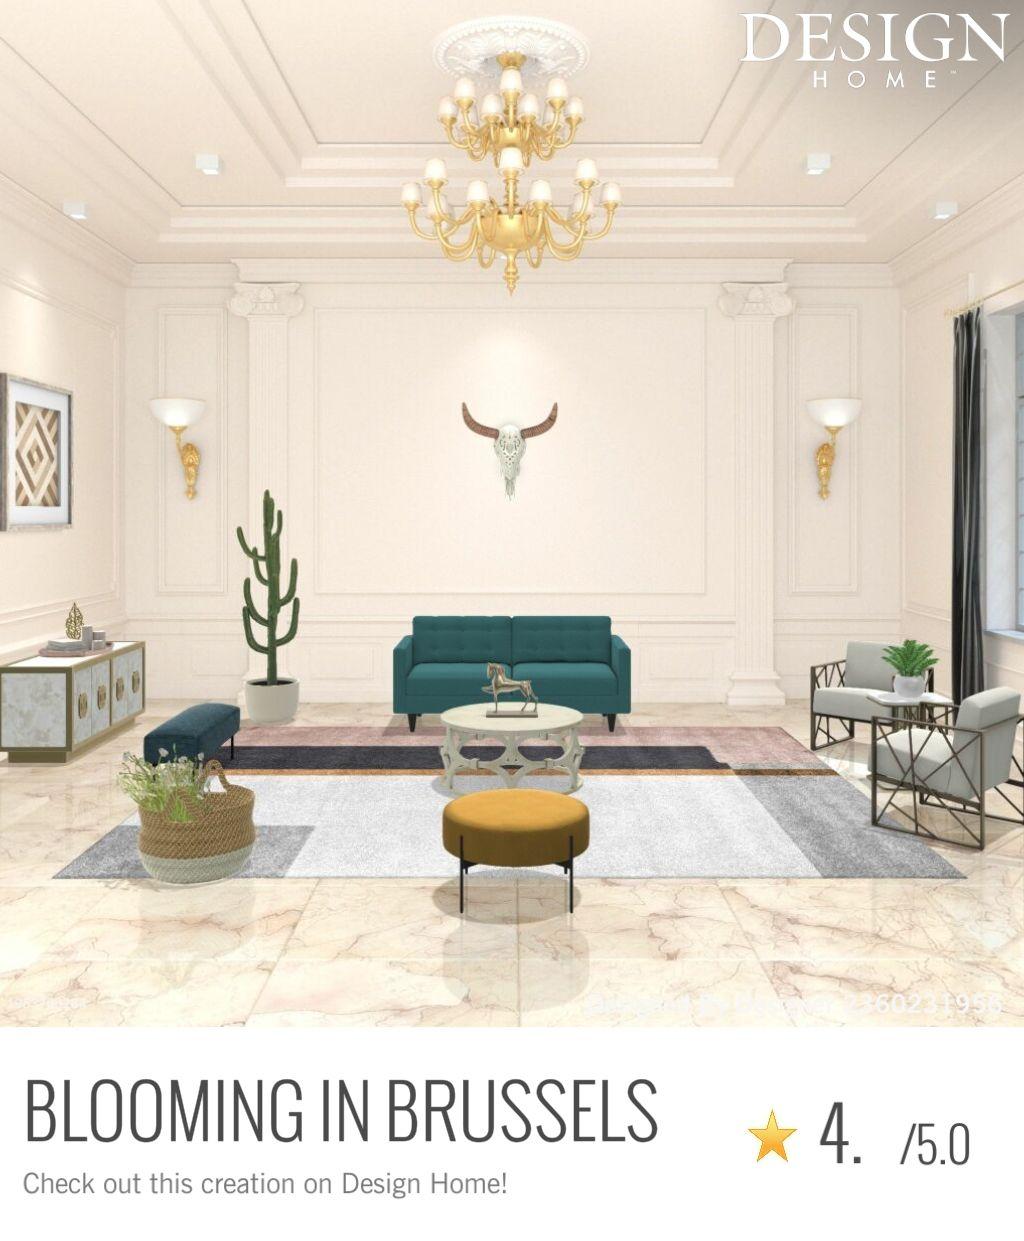 Pin By Lola Moni On Design Home House Design Design Home App Design